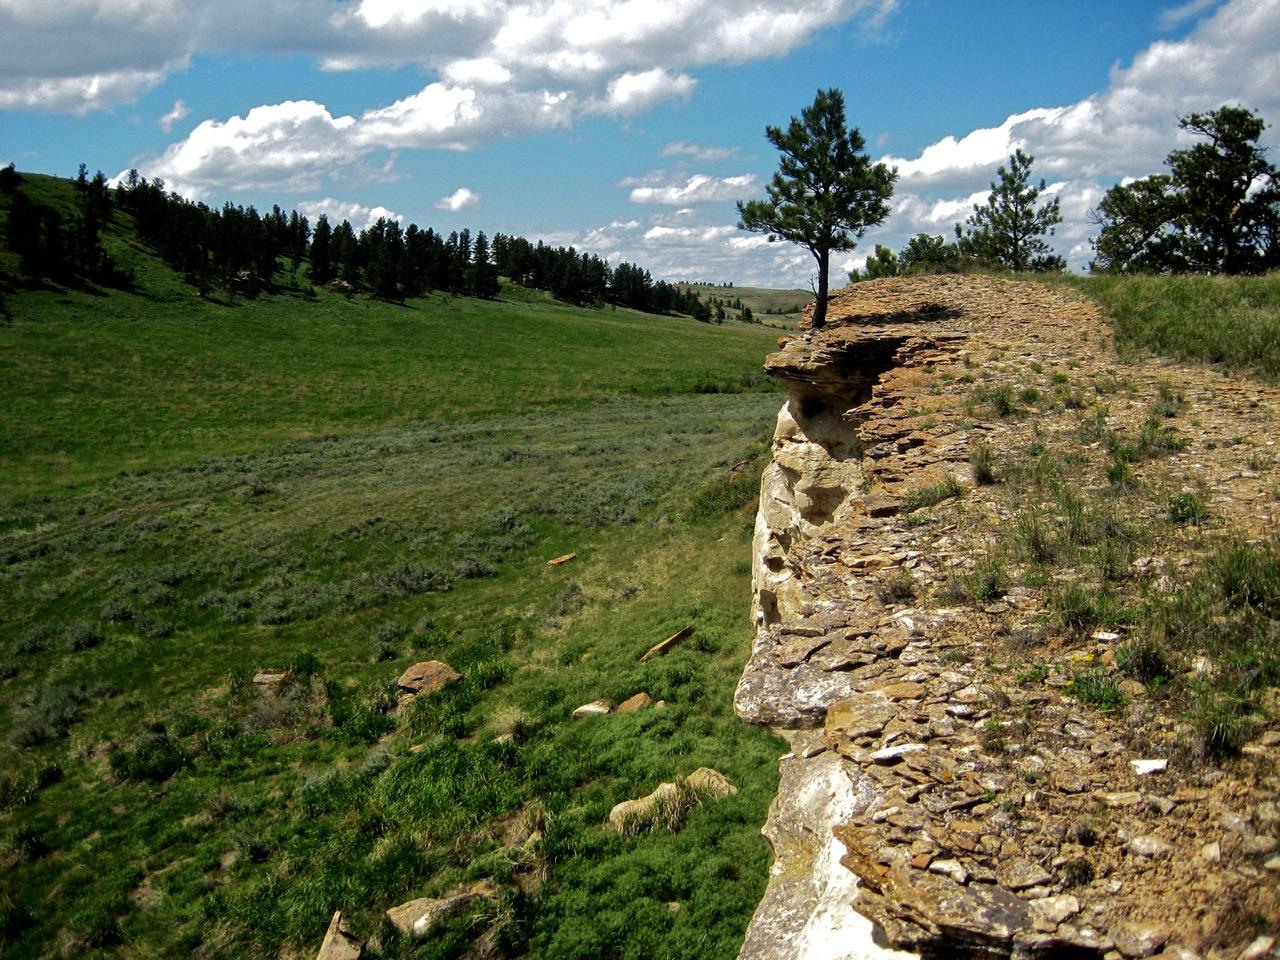 120. Buffalo Jump (8), Rosebud Battlefield, Montana, USA, 2008.